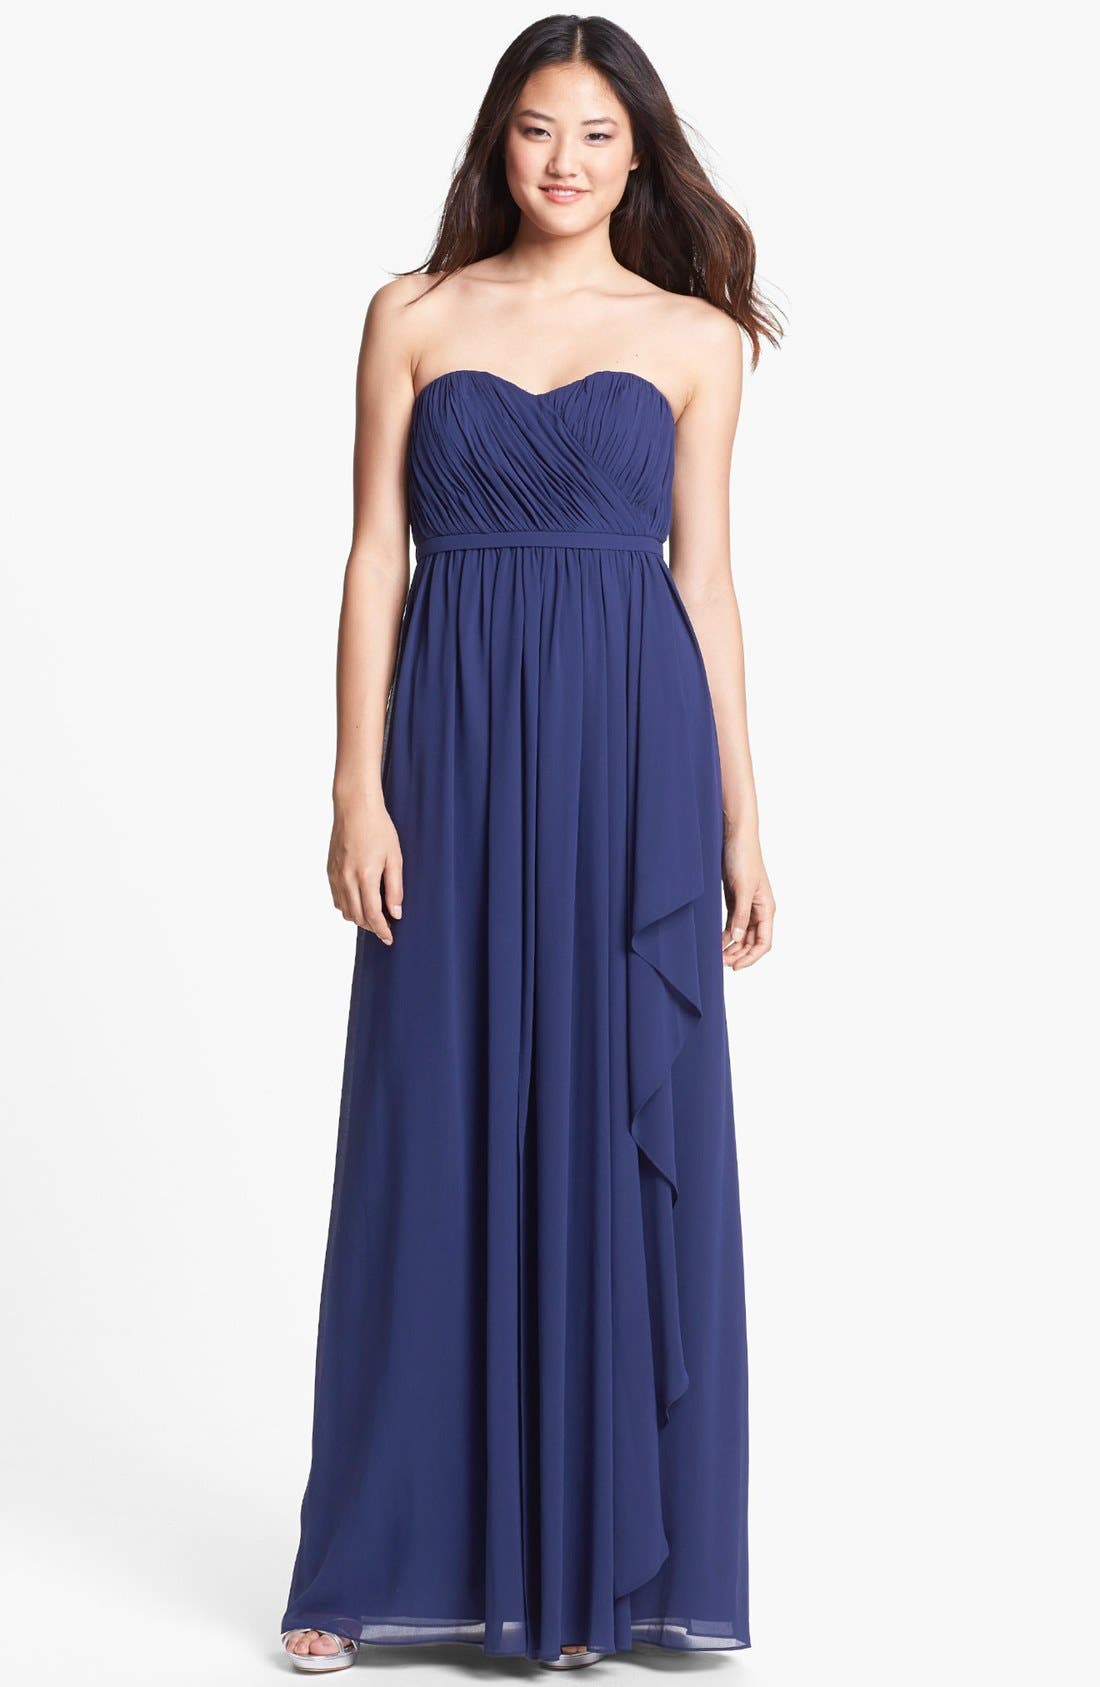 Alternate Image 1 Selected - Donna Morgan 'Lily' Draped Chiffon Dress